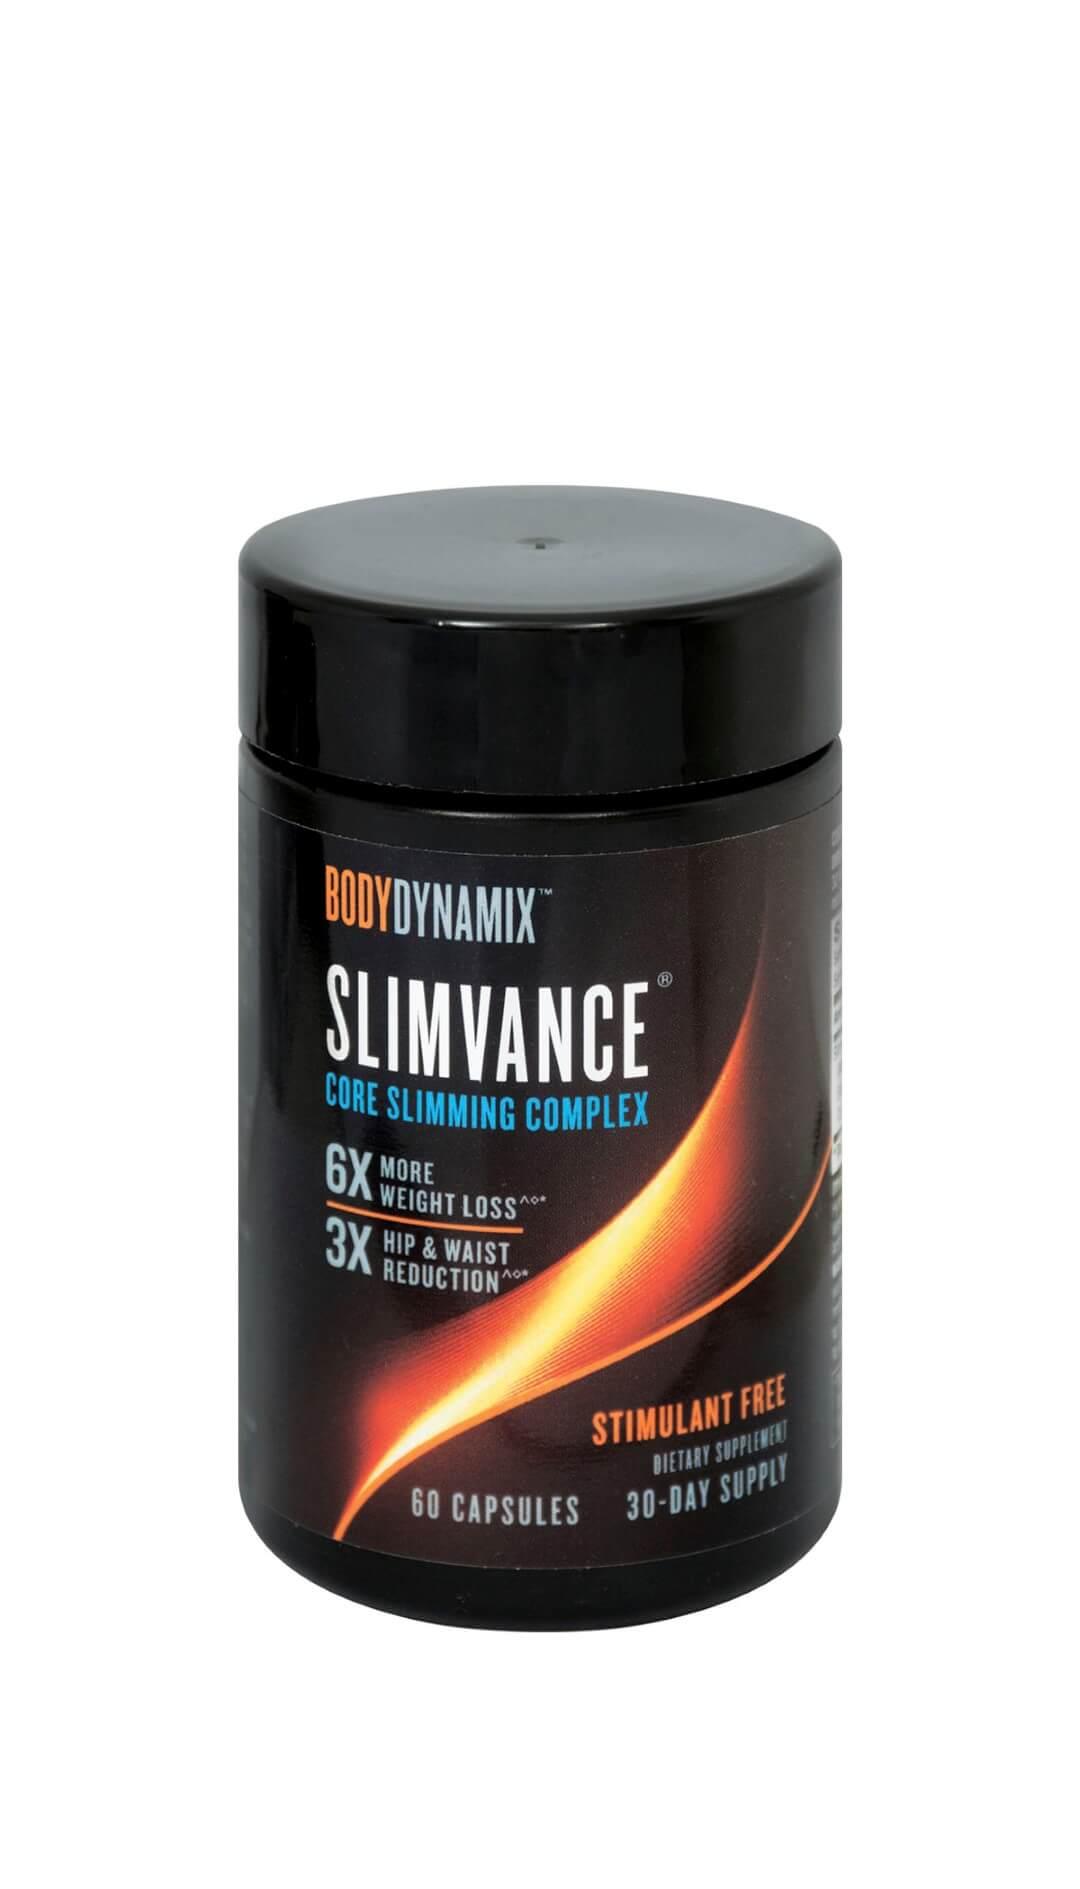 Slimvance Core Slimming Stimulant Free Gnc Live Well